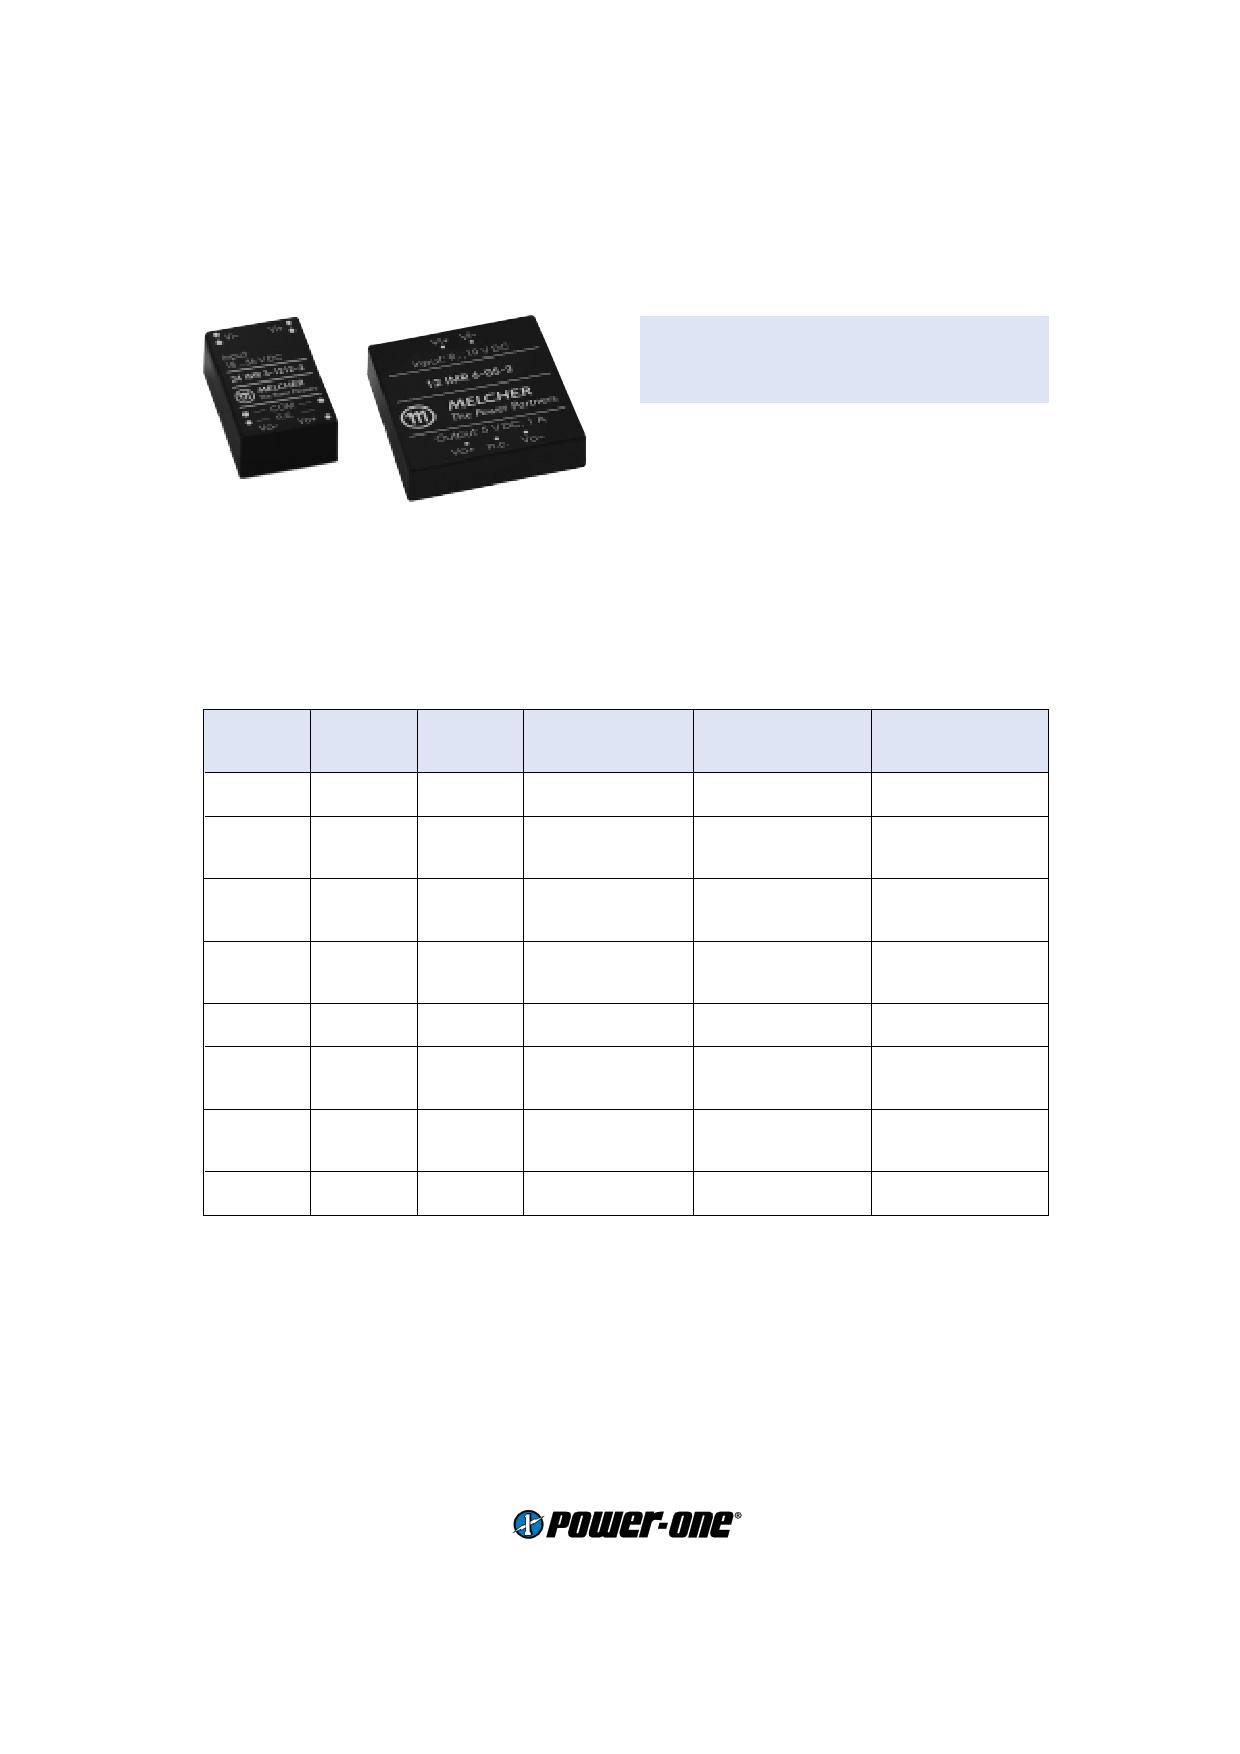 24IMR15-12-2 datasheet